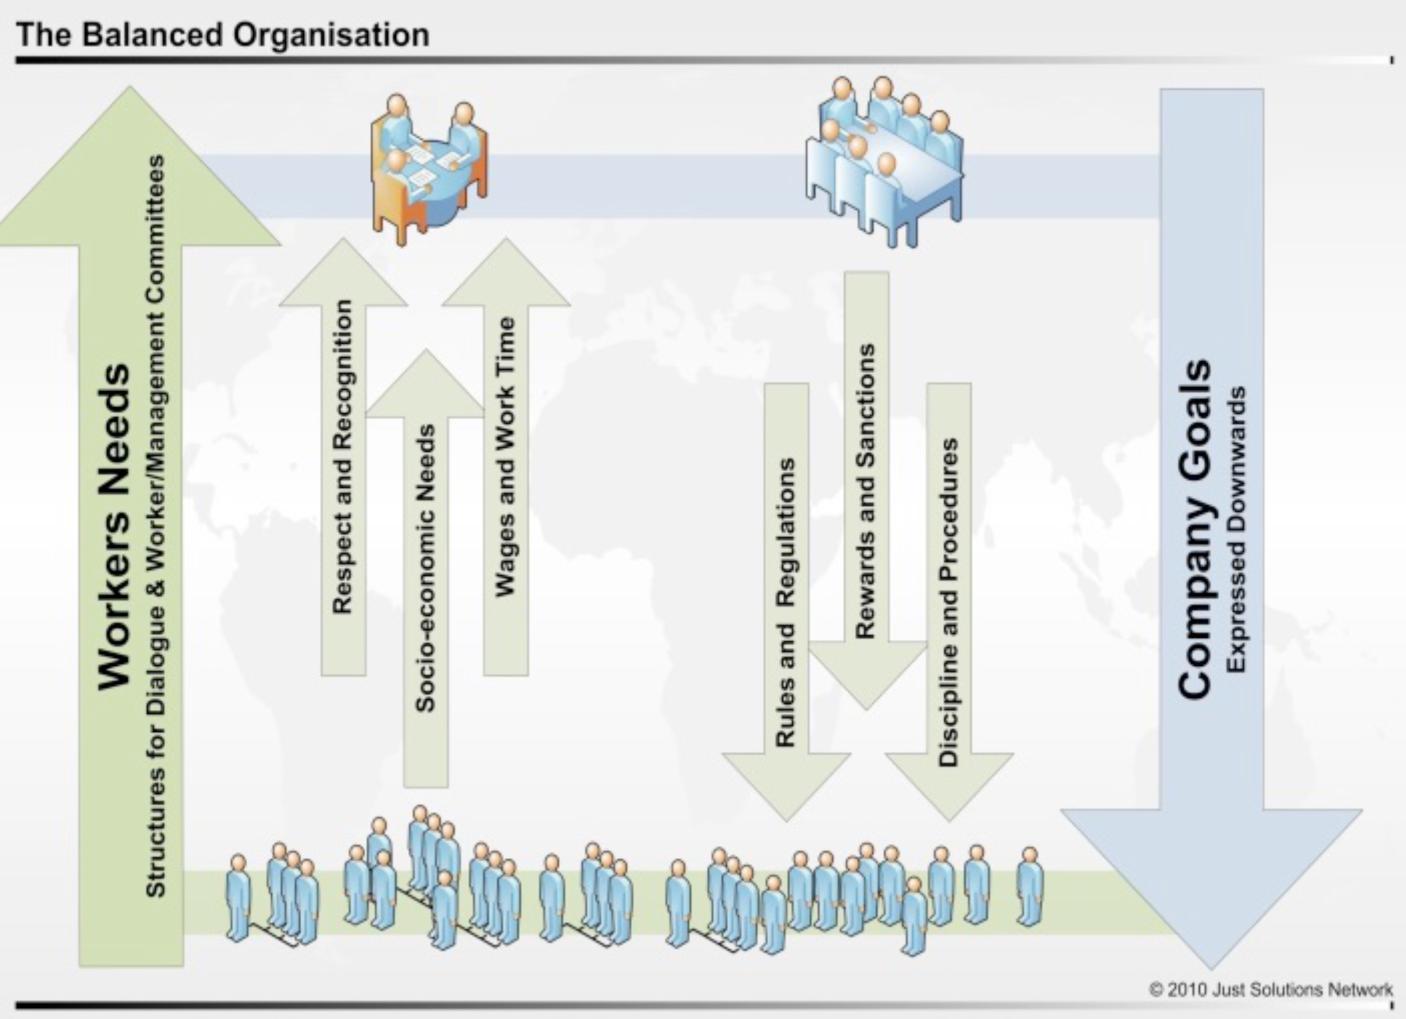 The Balanced Organisation